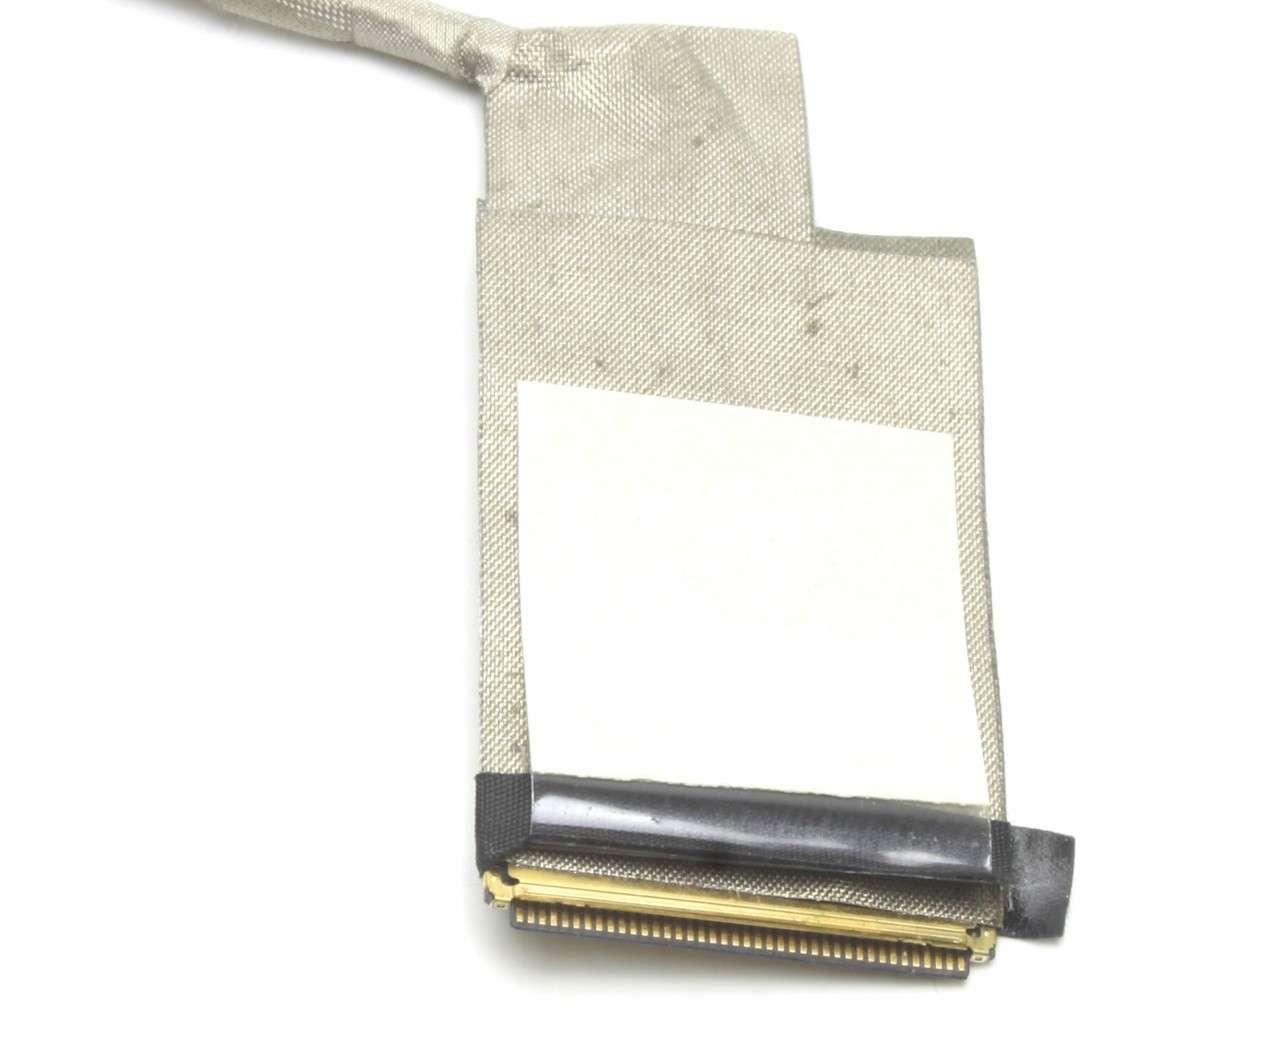 Cablu video LVDS Sony 50 4MR05 001 imagine powerlaptop.ro 2021